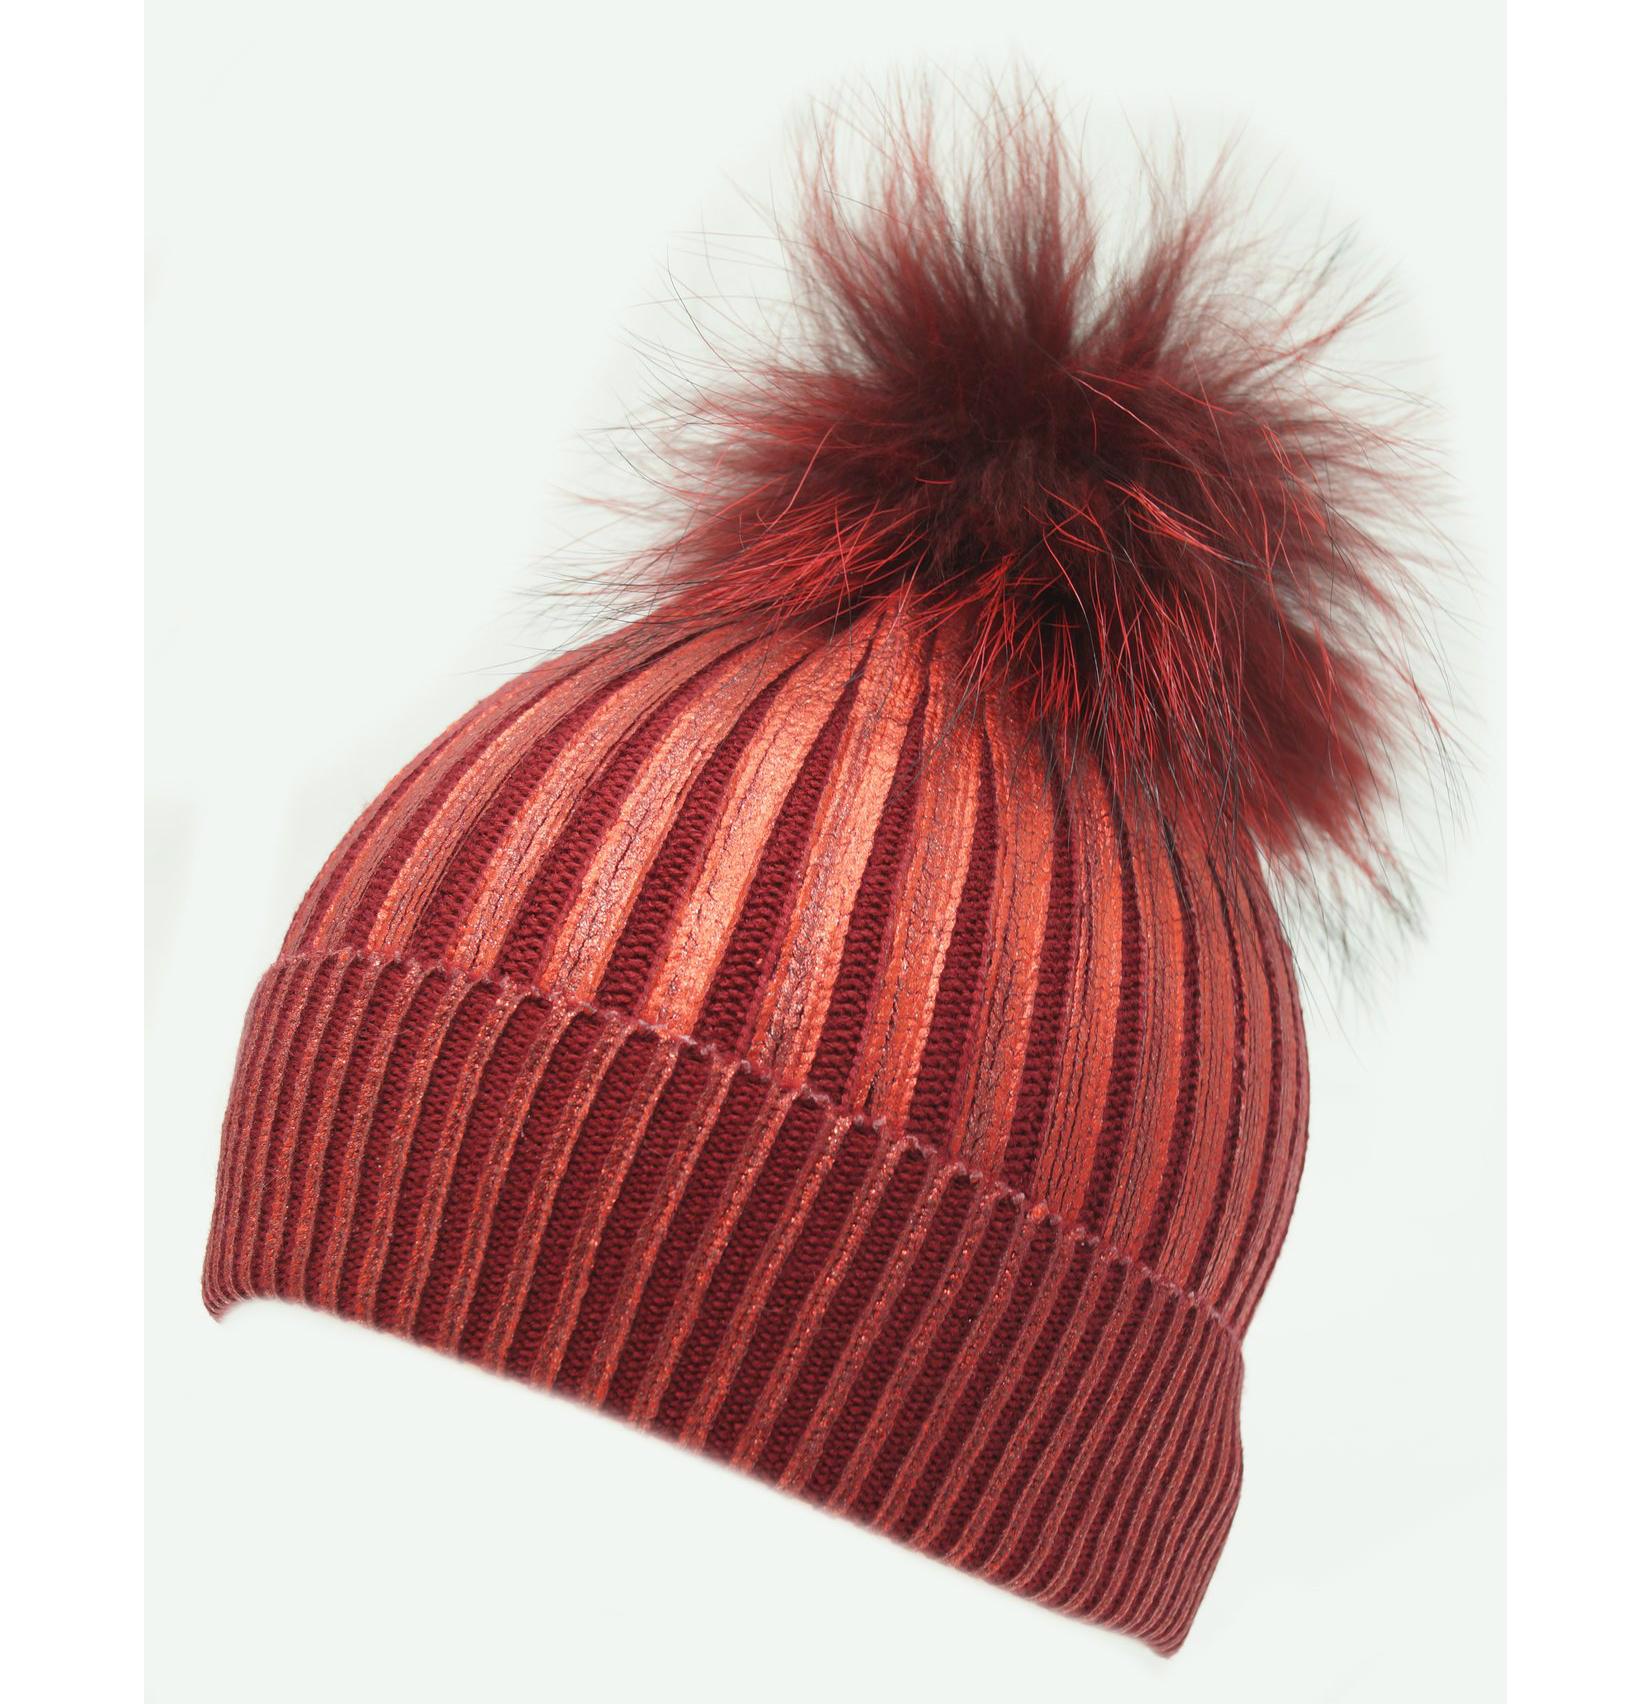 00f5c247b0a New Kids Metallic Winter Hat Shiny Glitter Beanie Pom Pom Large ...